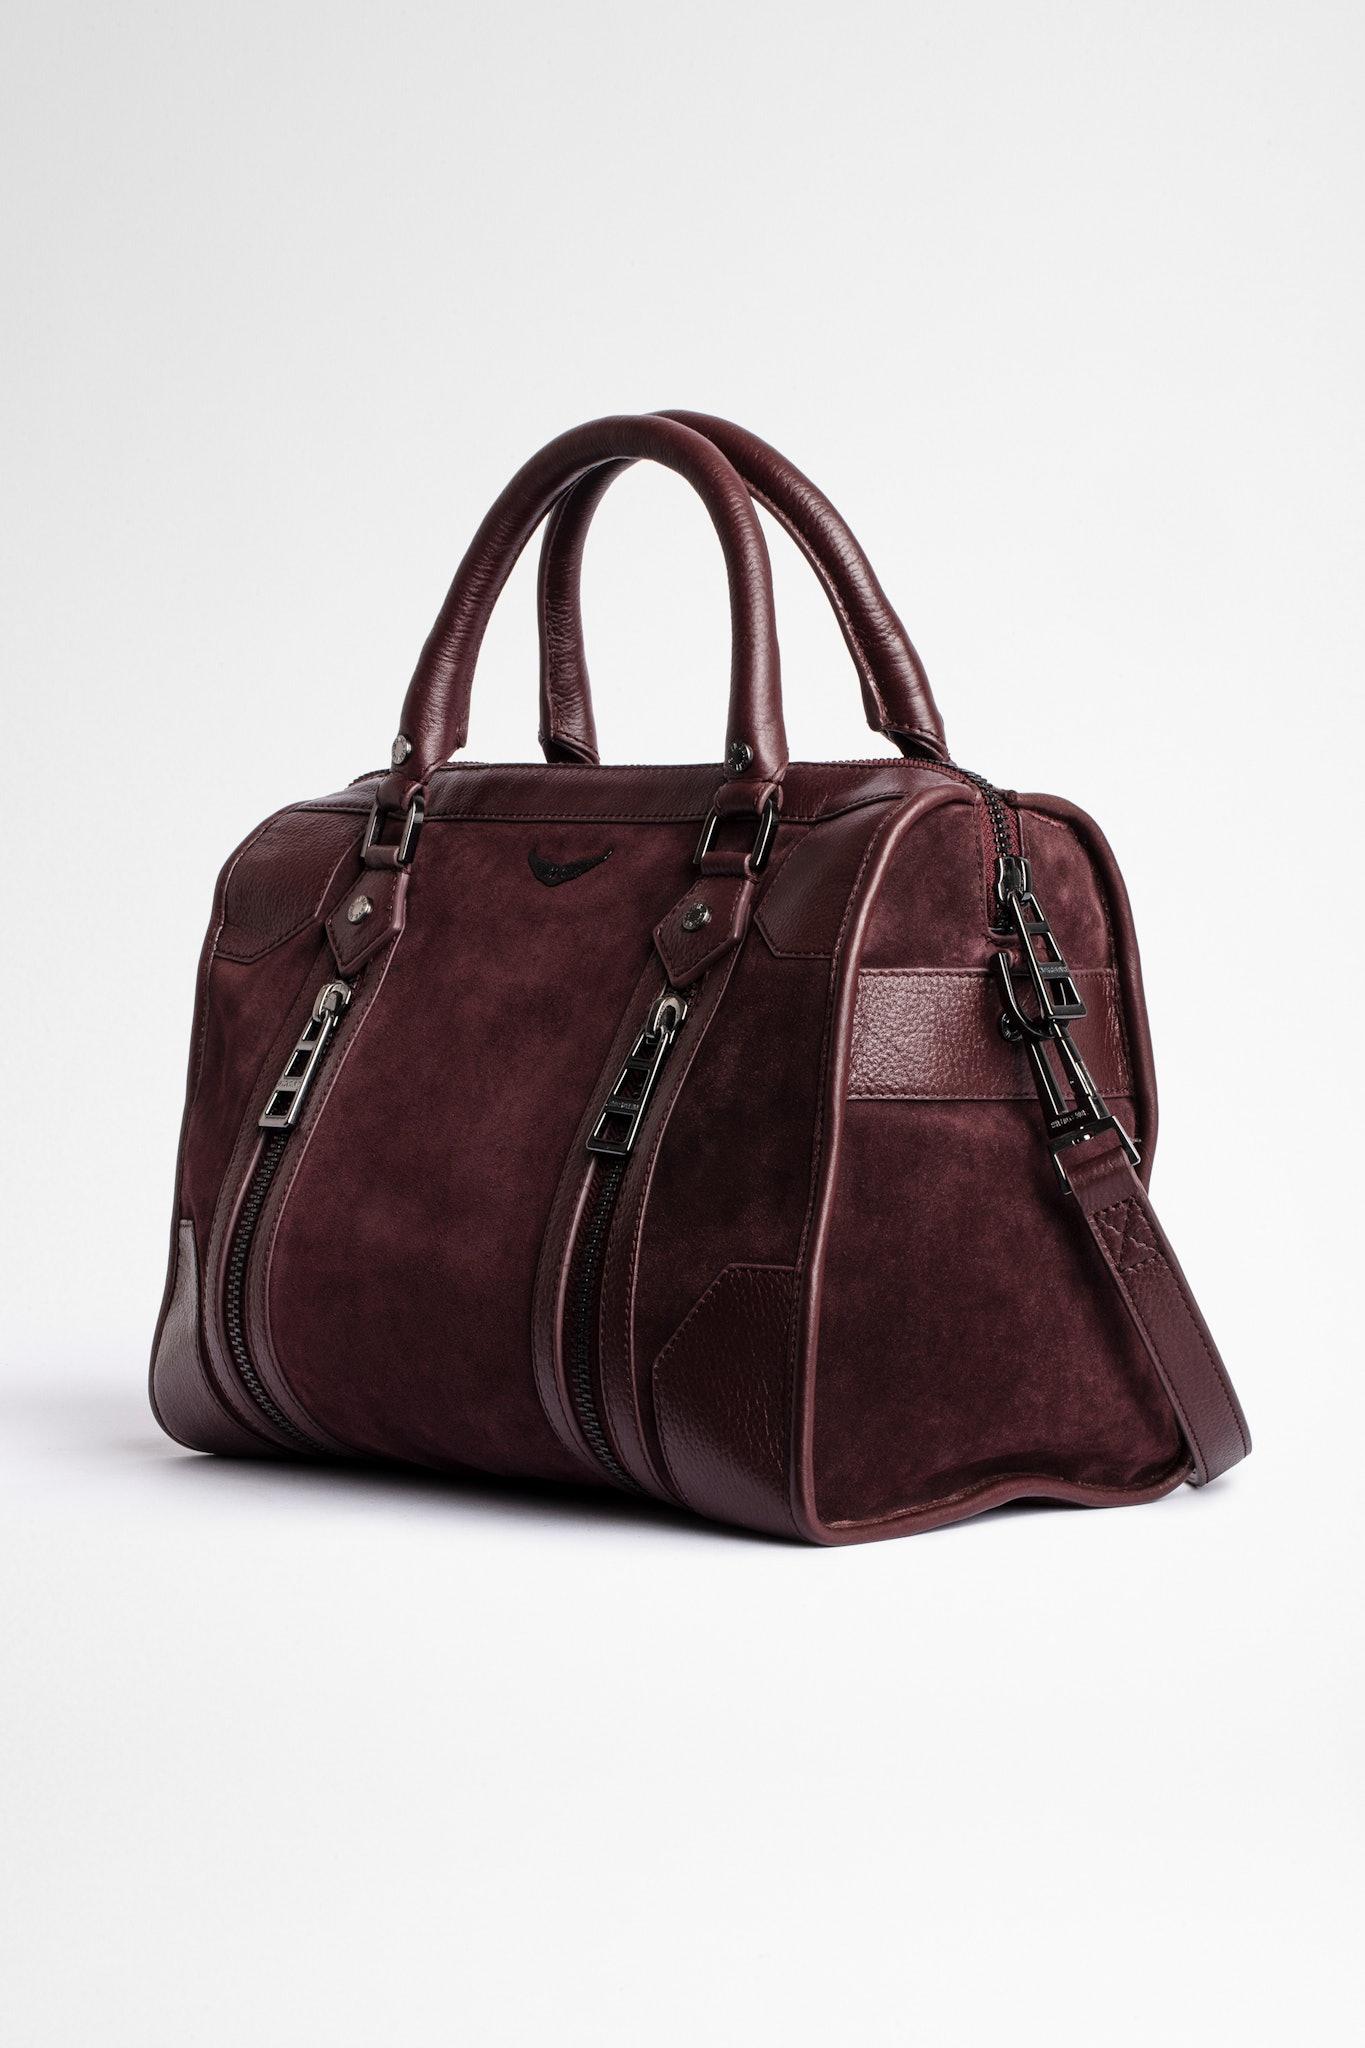 Sunny Medium #2 Bag